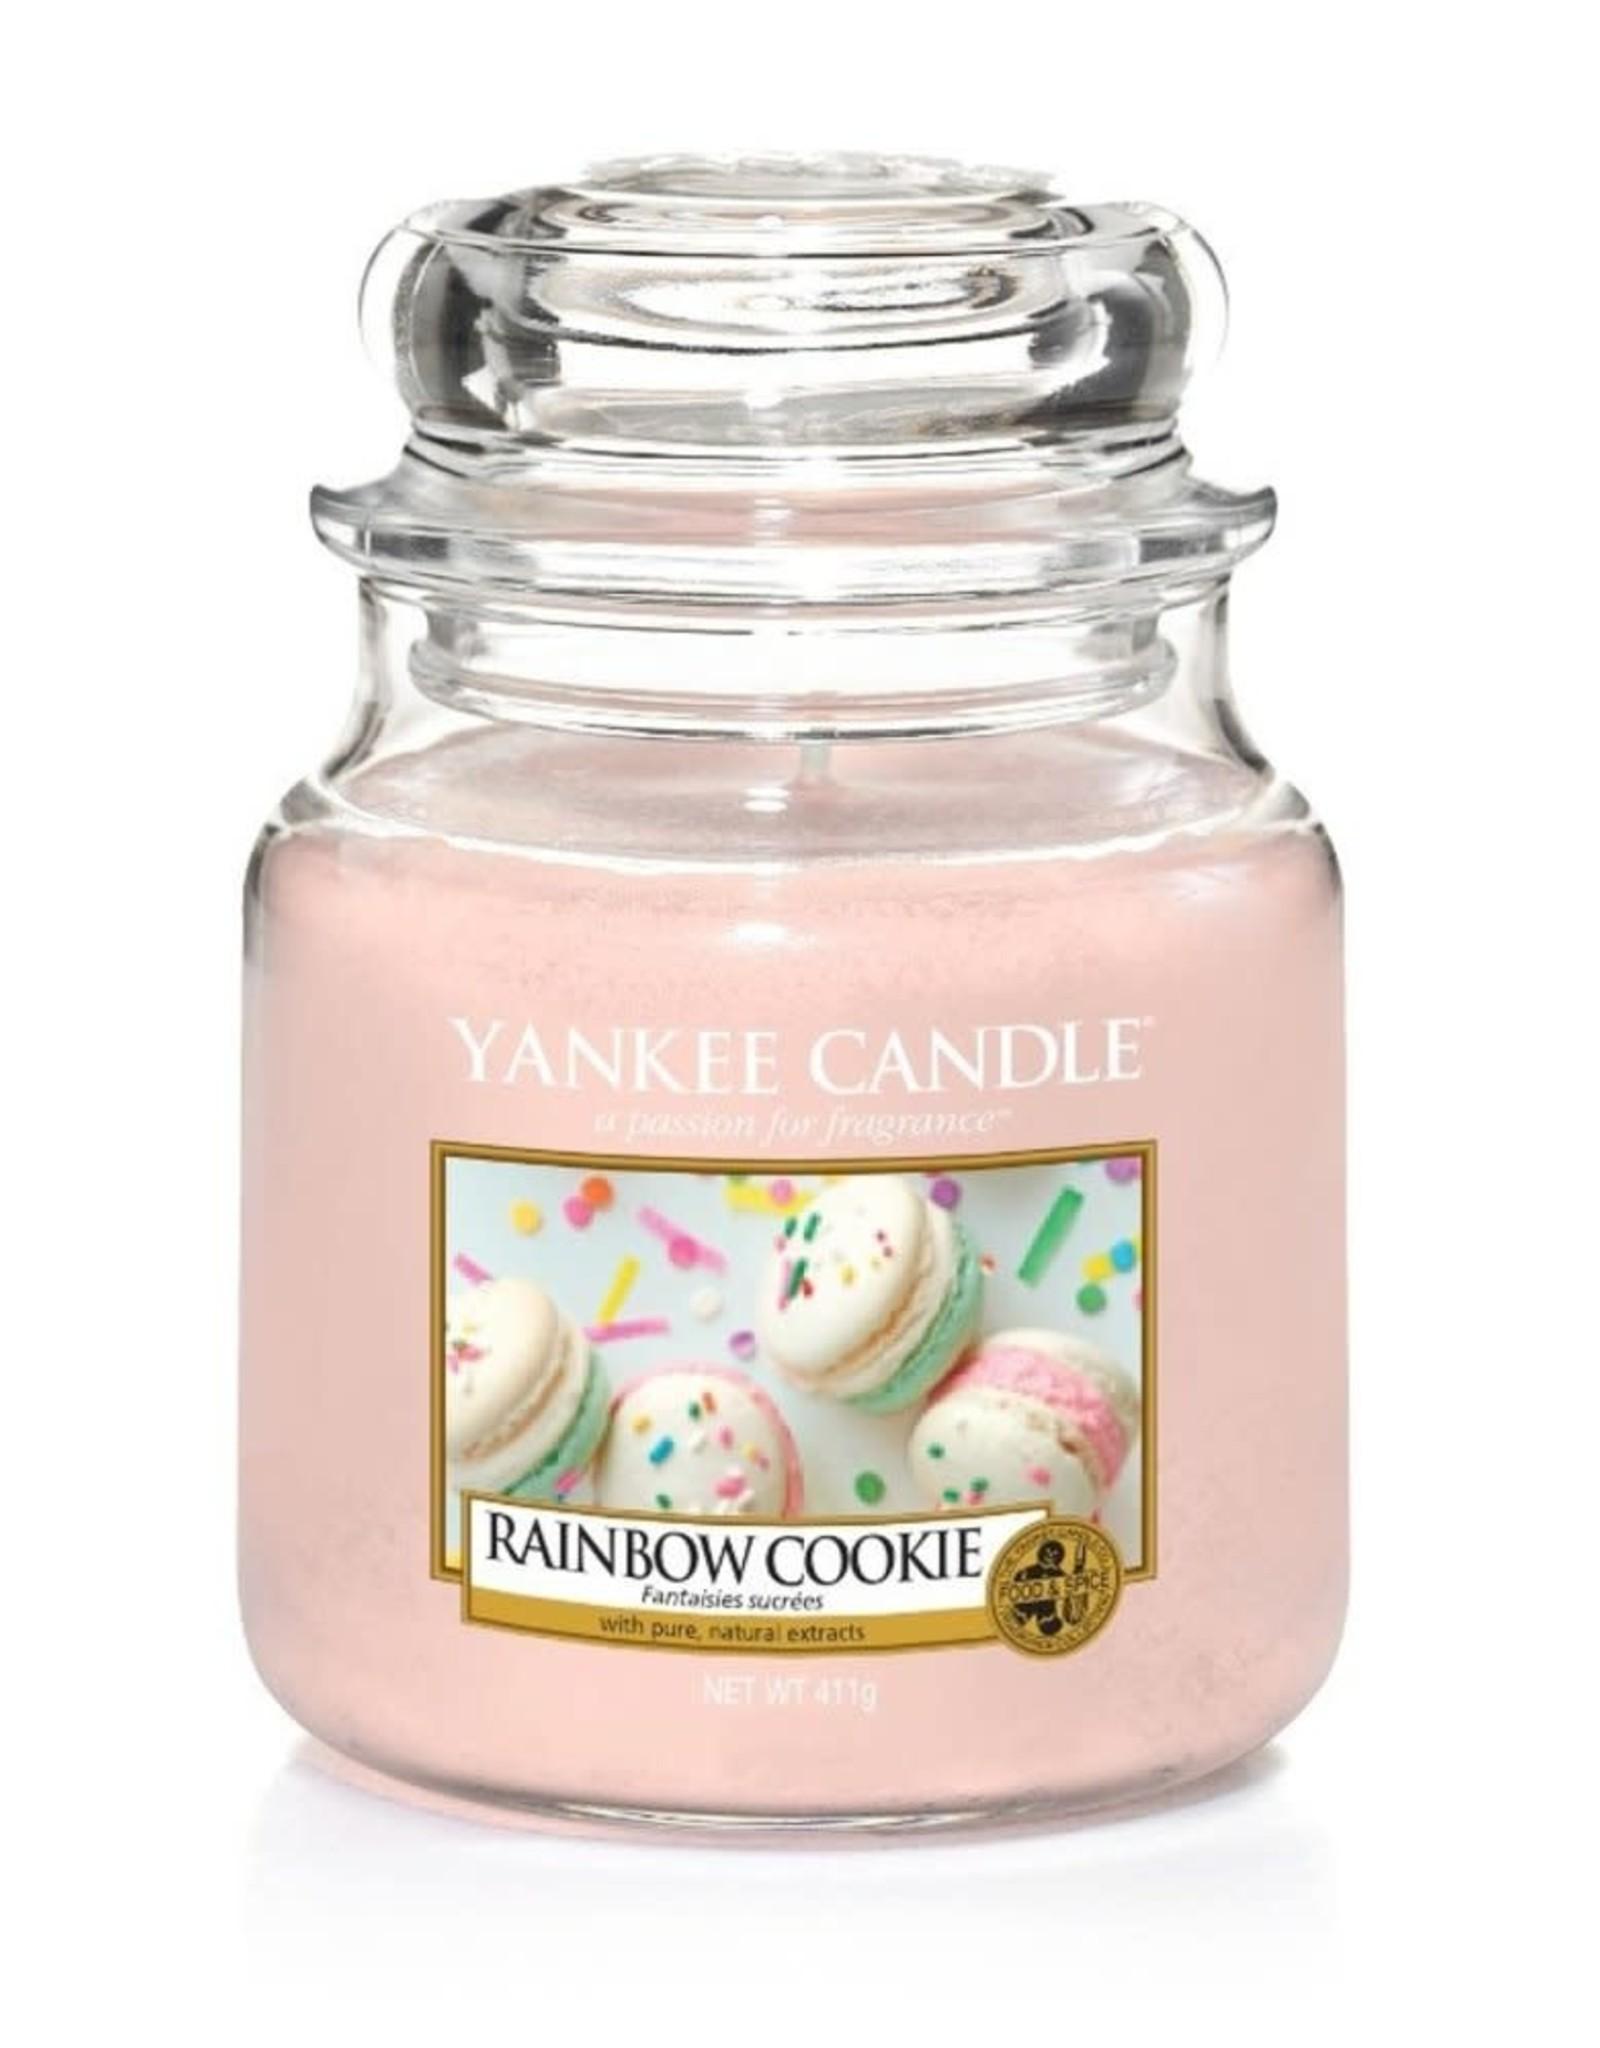 Yankee Candle Rainbow Cookie Yankee Candle Medium